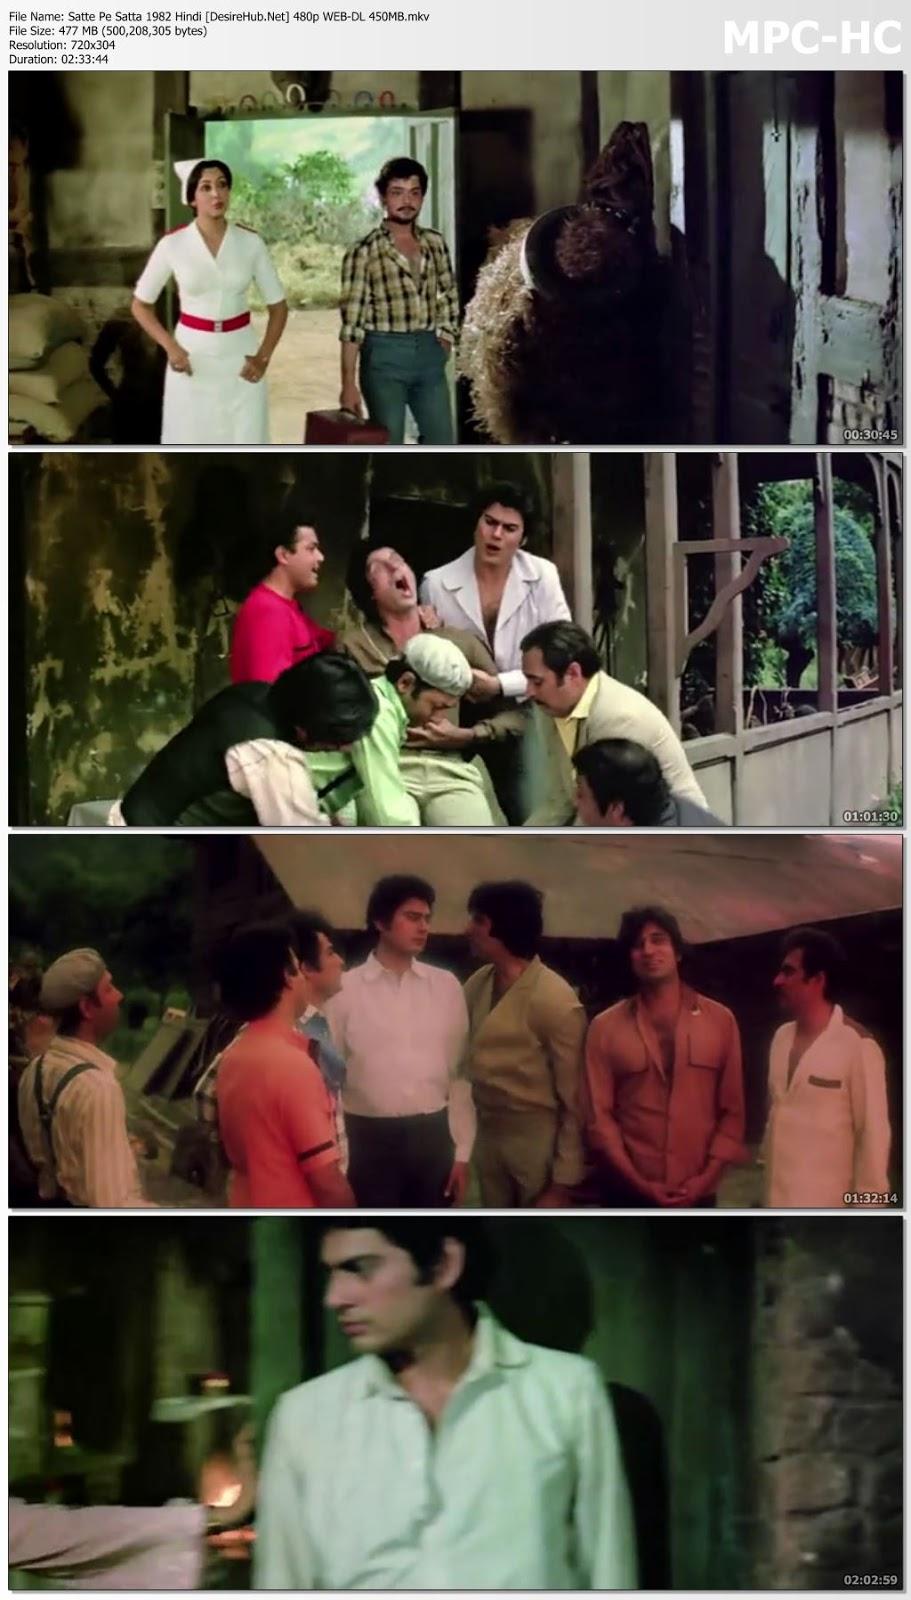 Satte Pe Satta 1982 Hindi 480p WEB-DL 450MB Desirehub